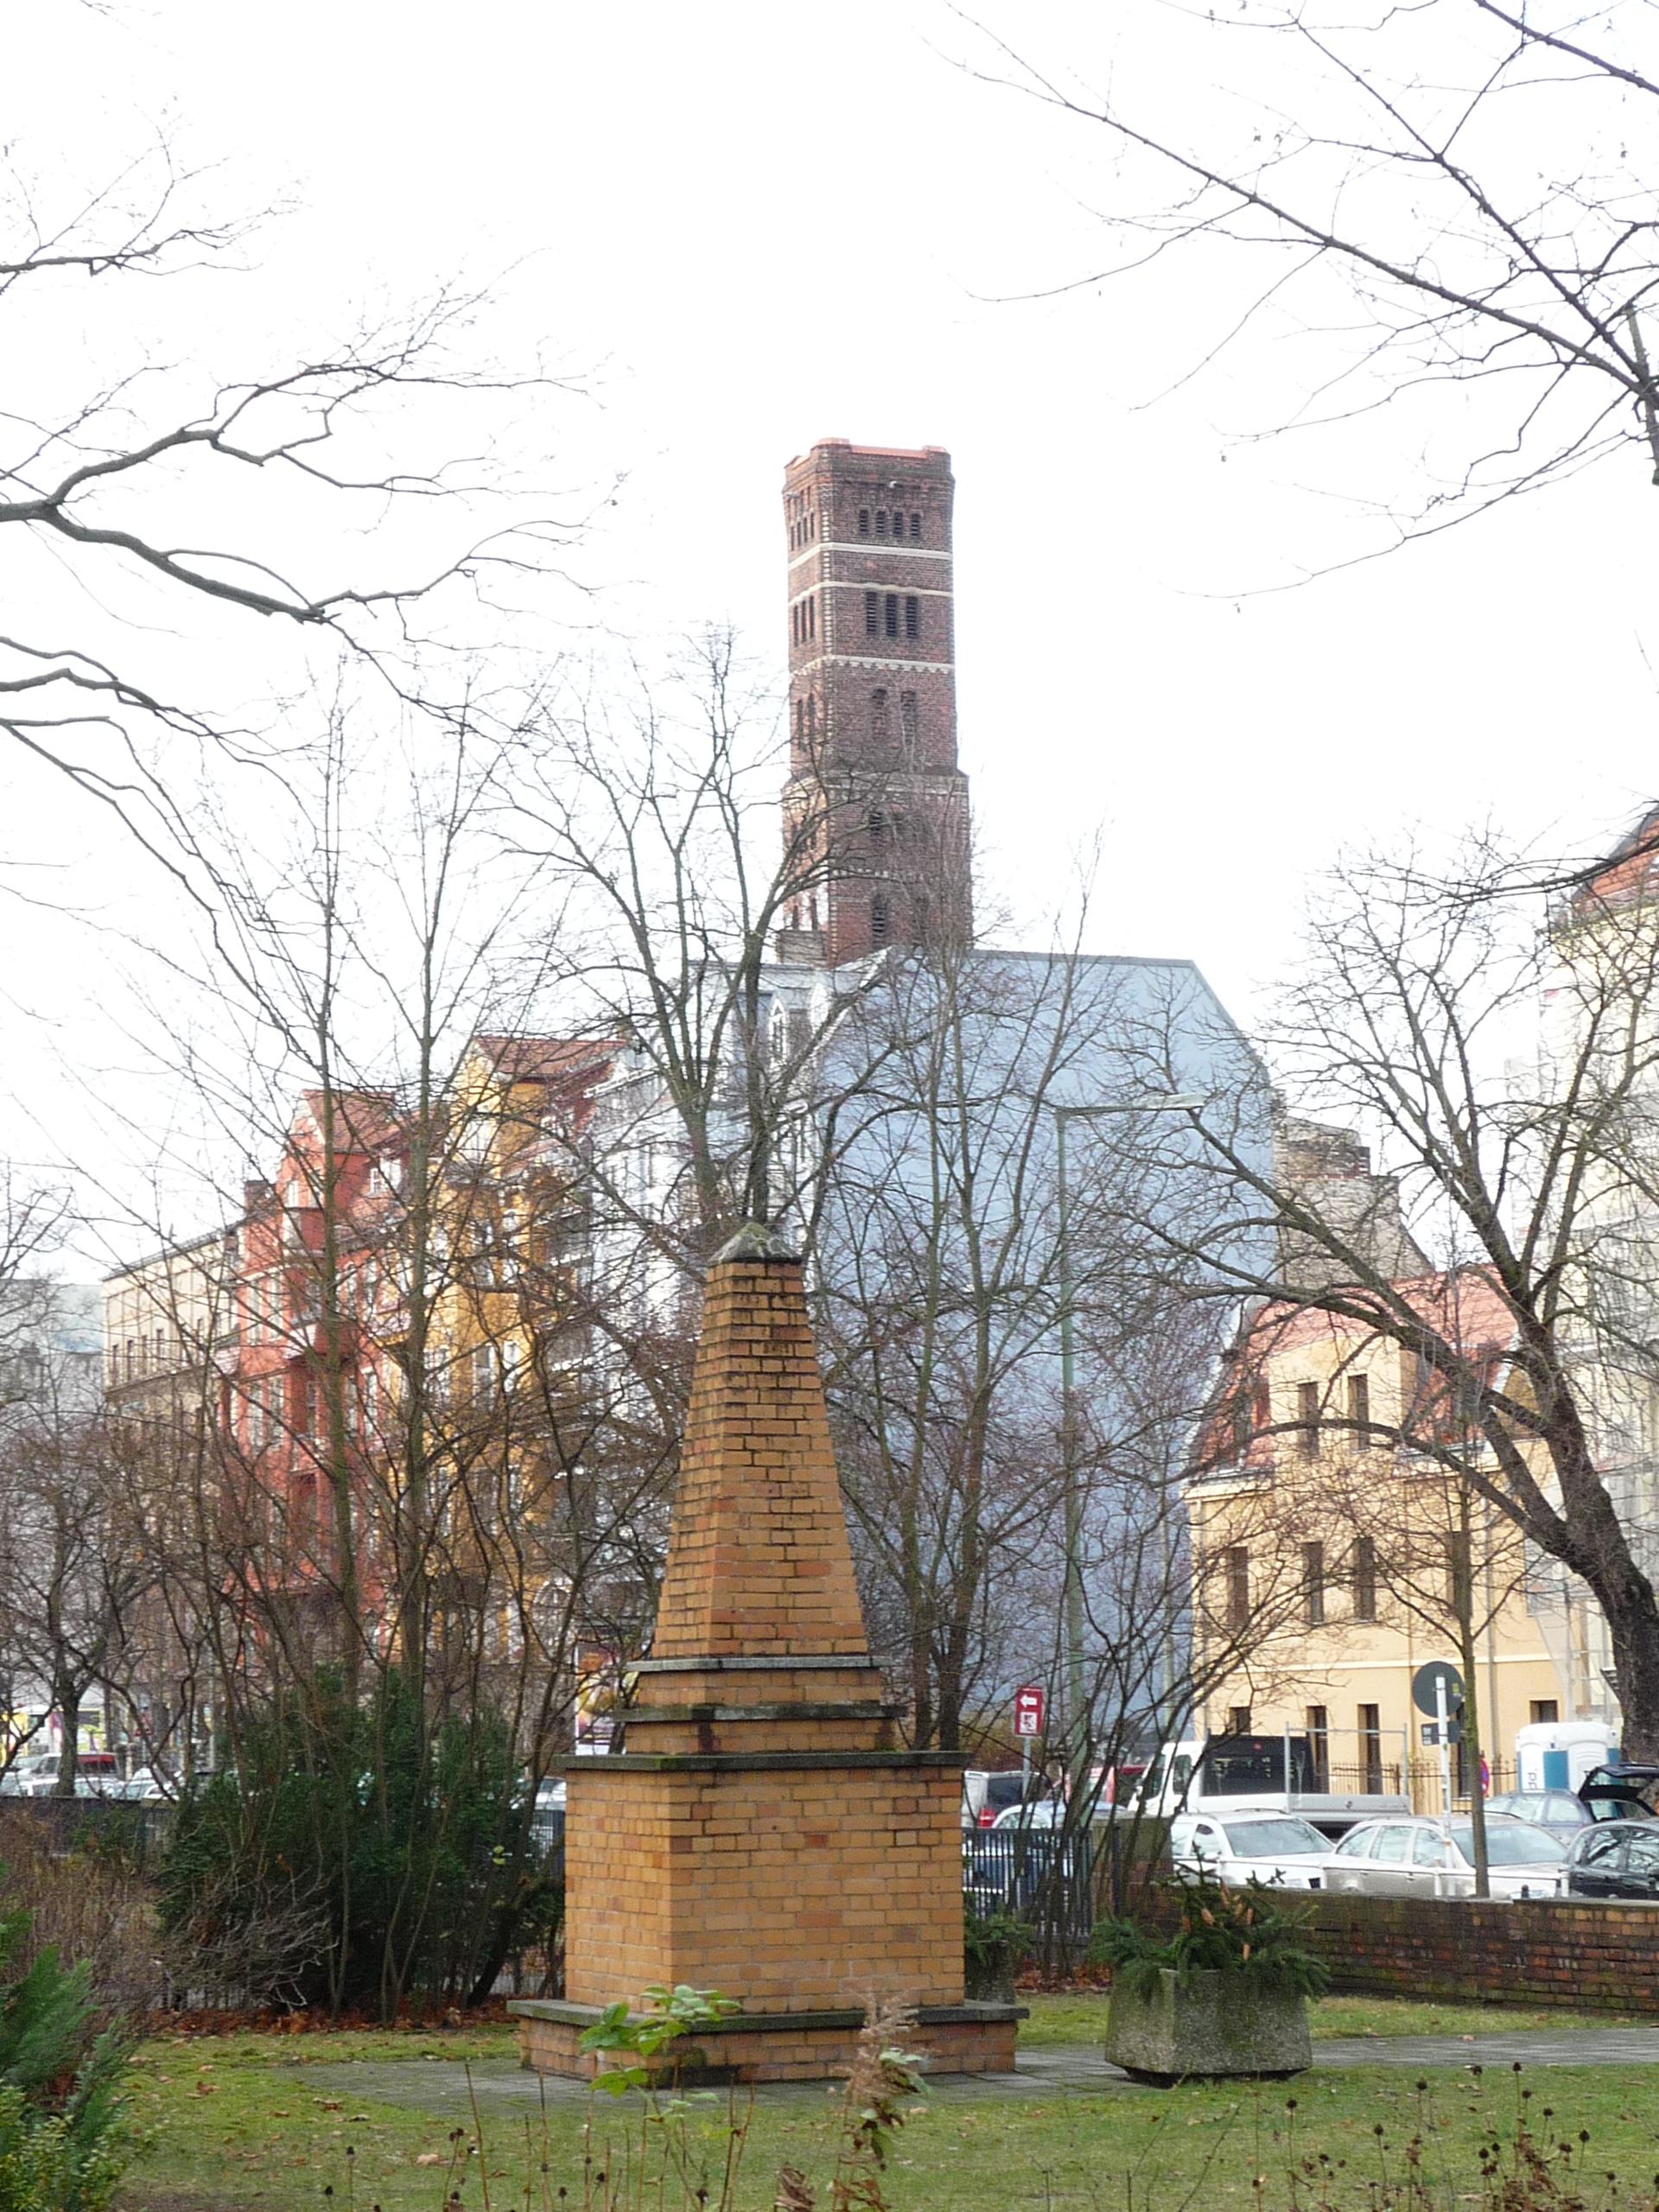 Kino Berlin Lichtenberg